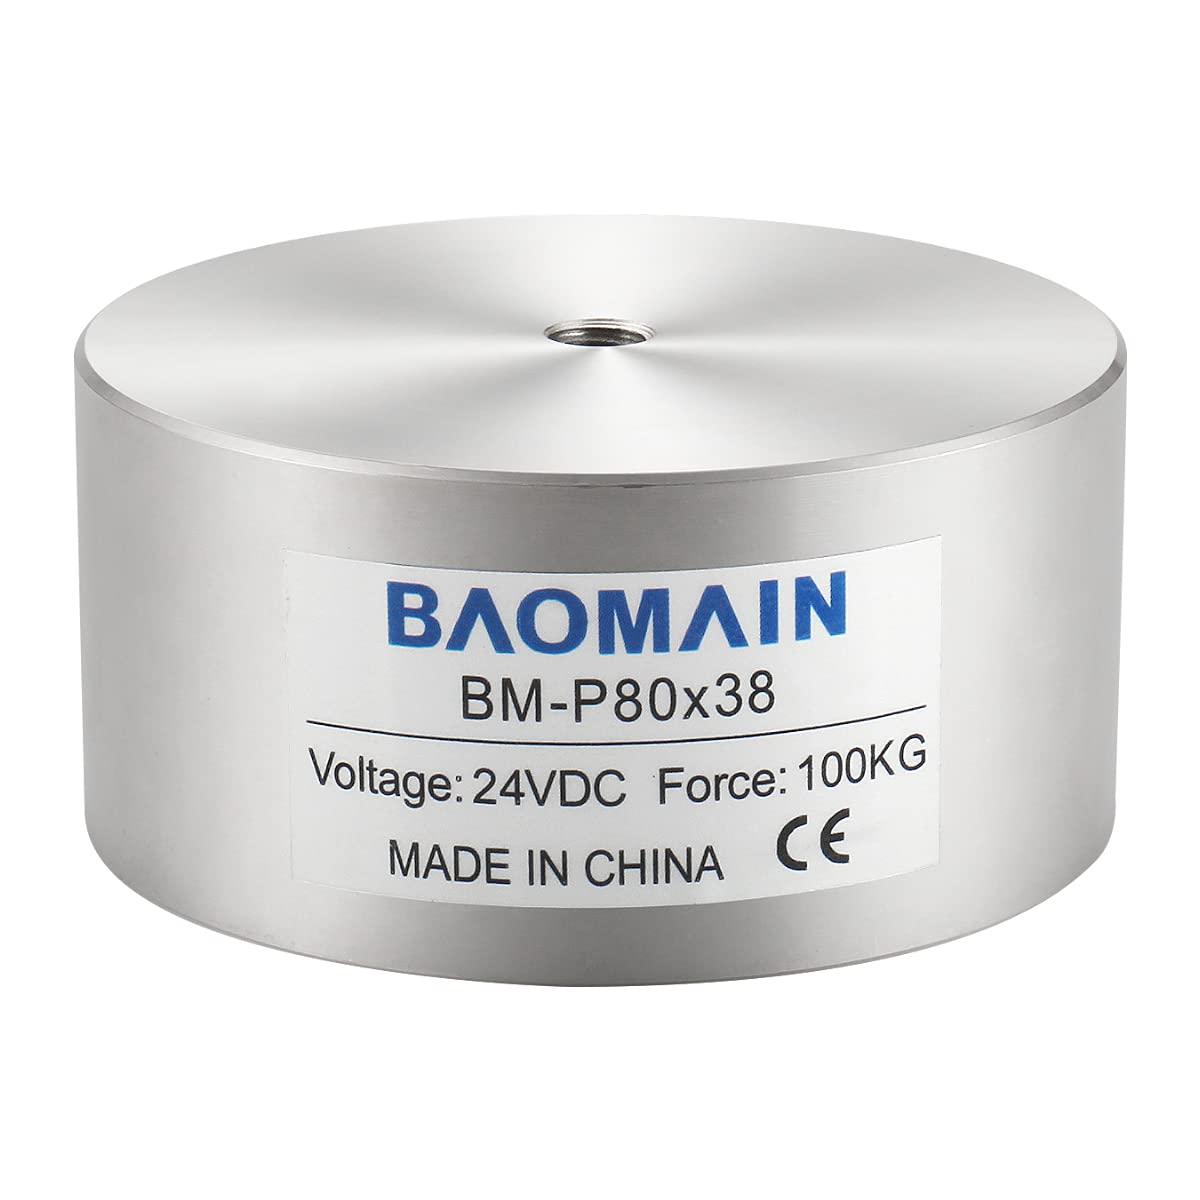 Dallas Mall Baomain Max 74% OFF Electromagnet Solenoid 24VDC 1000N 100kg 220LB Ele Force